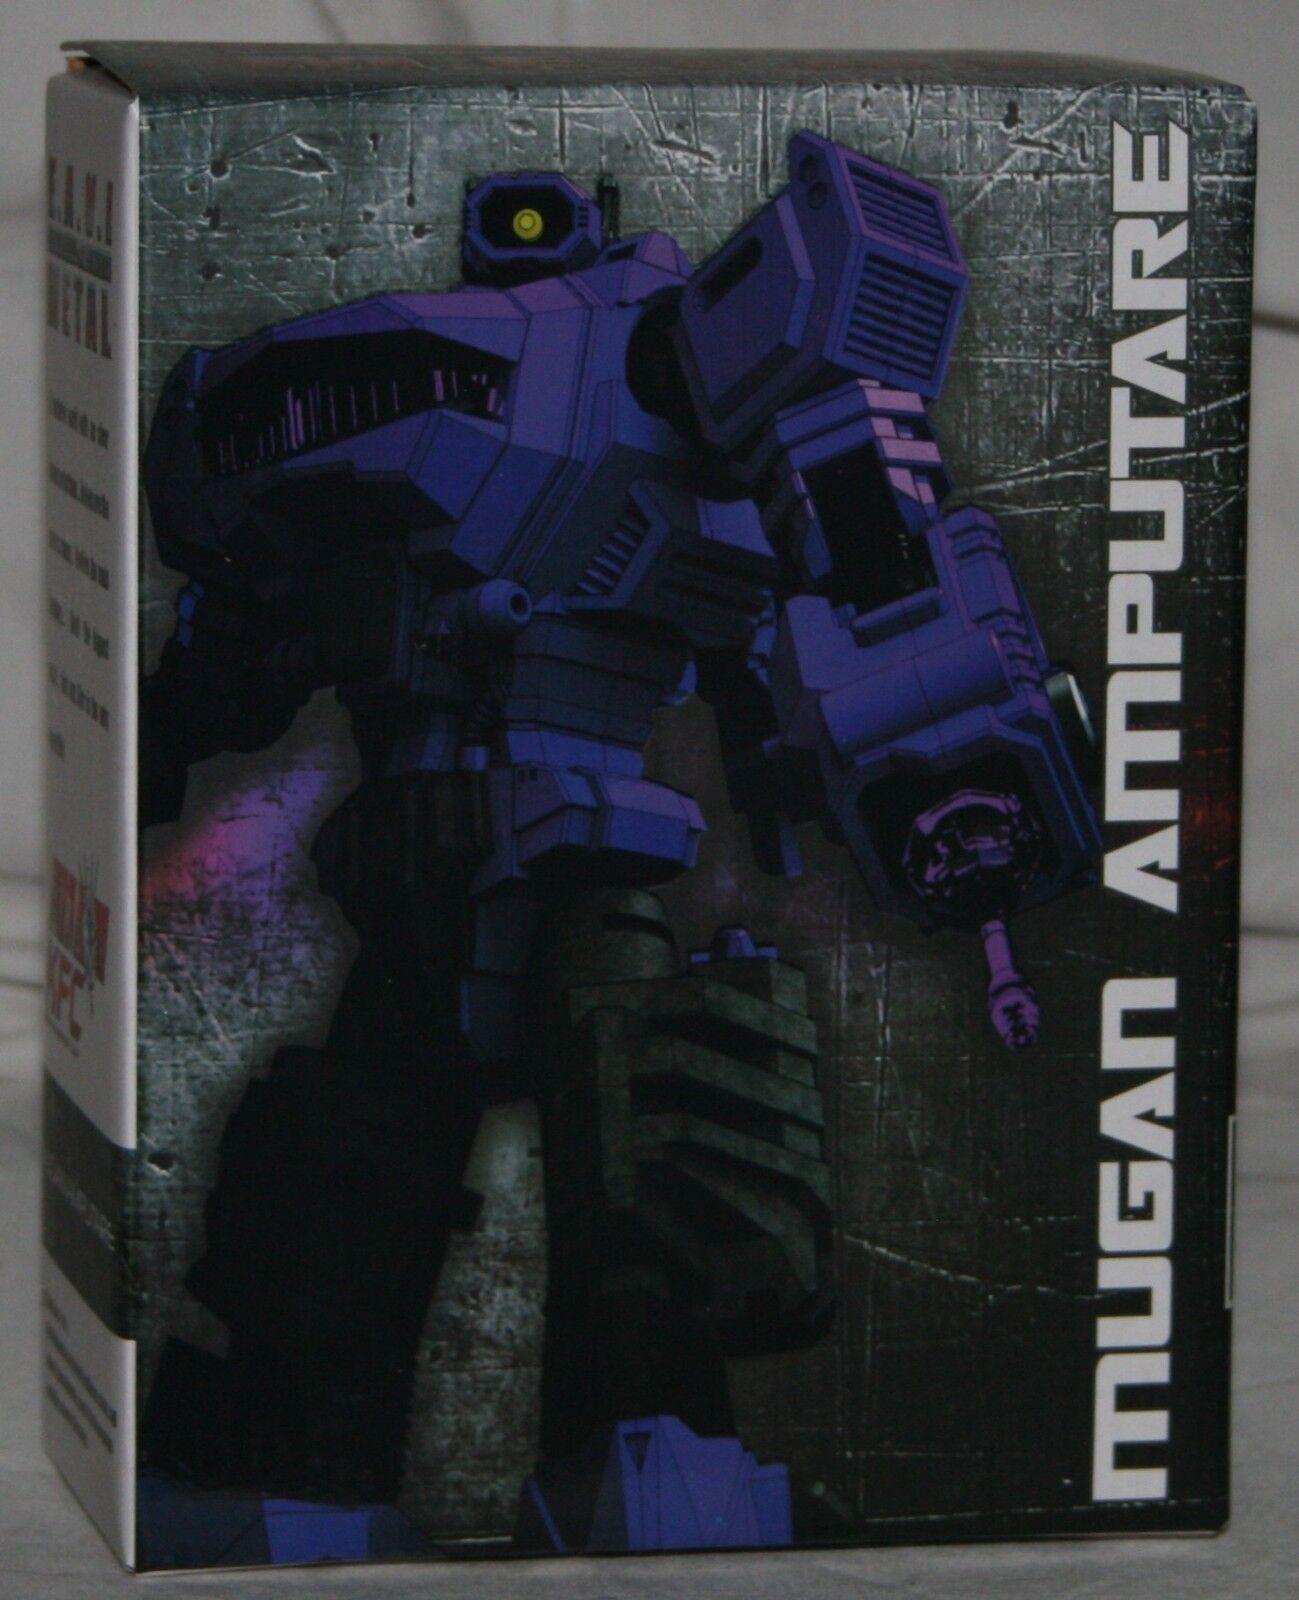 Transformers KFC e.a.v.i. metal Mugan Amputare MISB